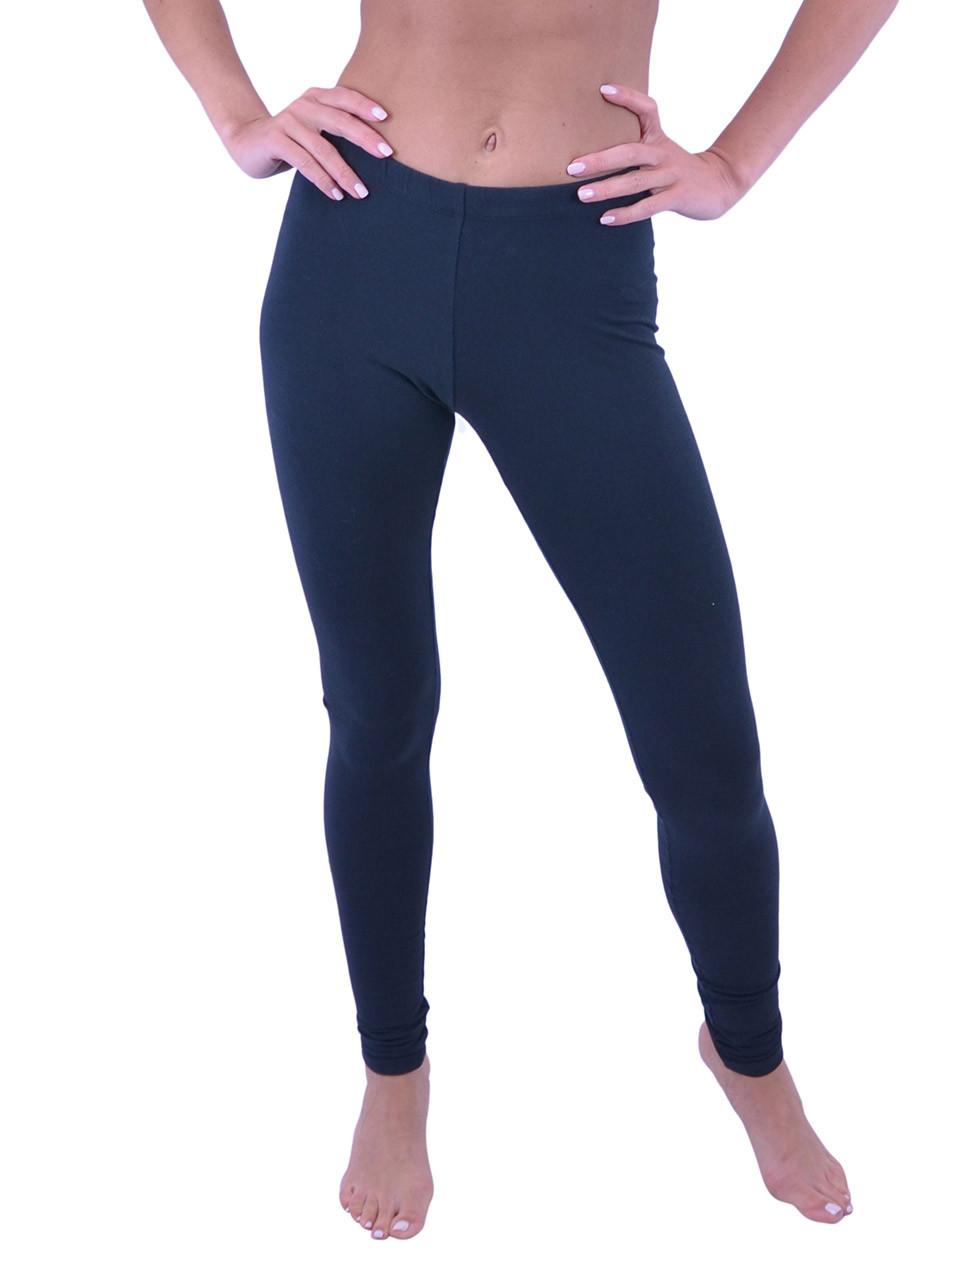 2d1723485e3a6f Vivian's Fashions Long Leggings - Cotton (Junior and Junior Plus Sizes) - Vivian's  Fashions